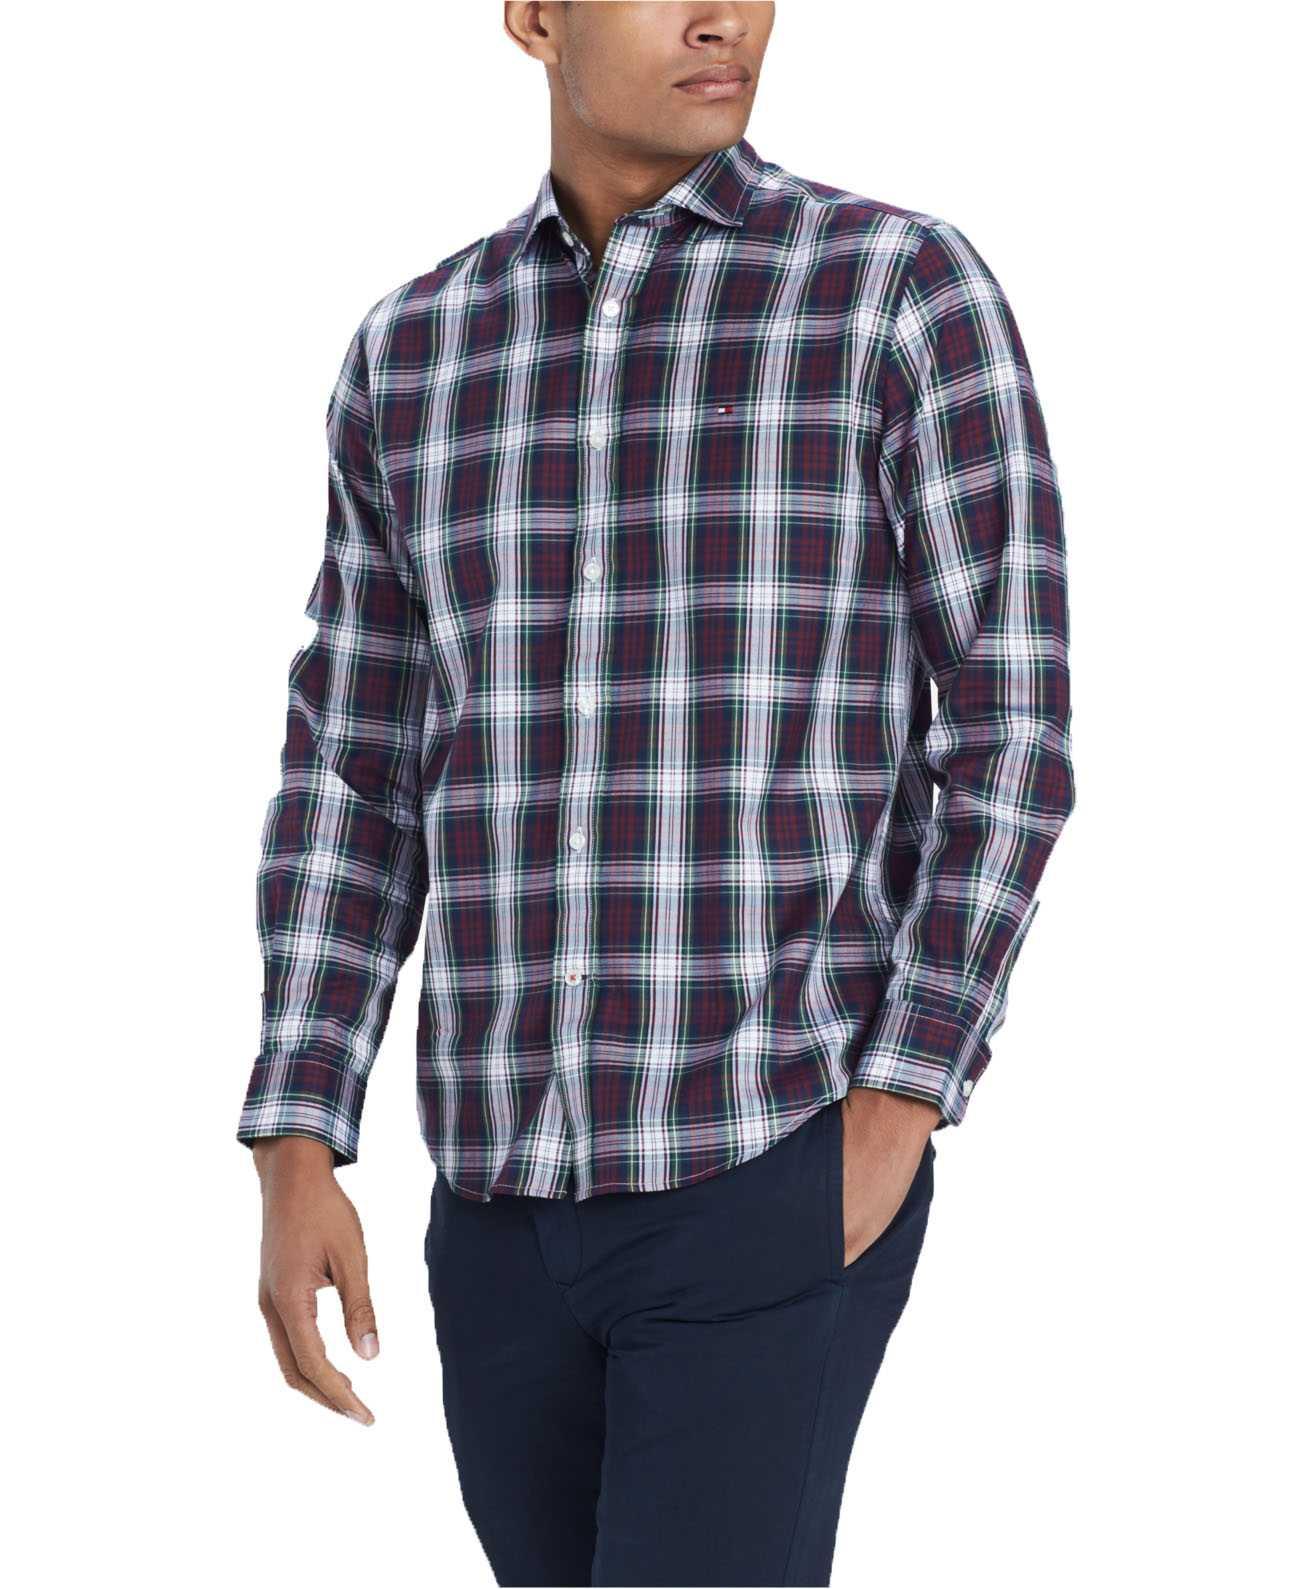 Tommy Hilfiger Mullins Classic Fit Plaid Shirt Multicolor Mens XL New